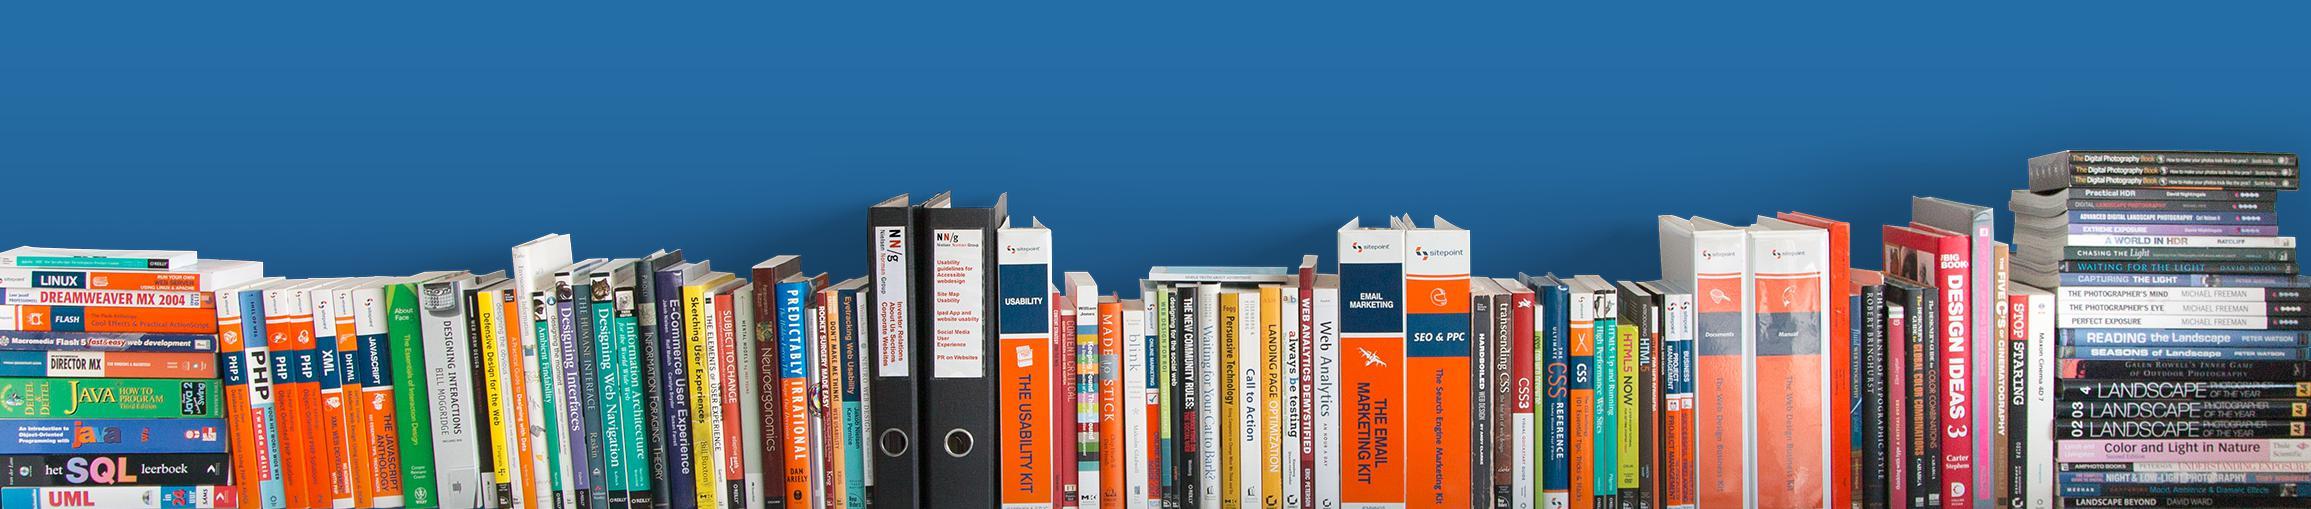 frederik-van-zande-print-books-learned.jpg